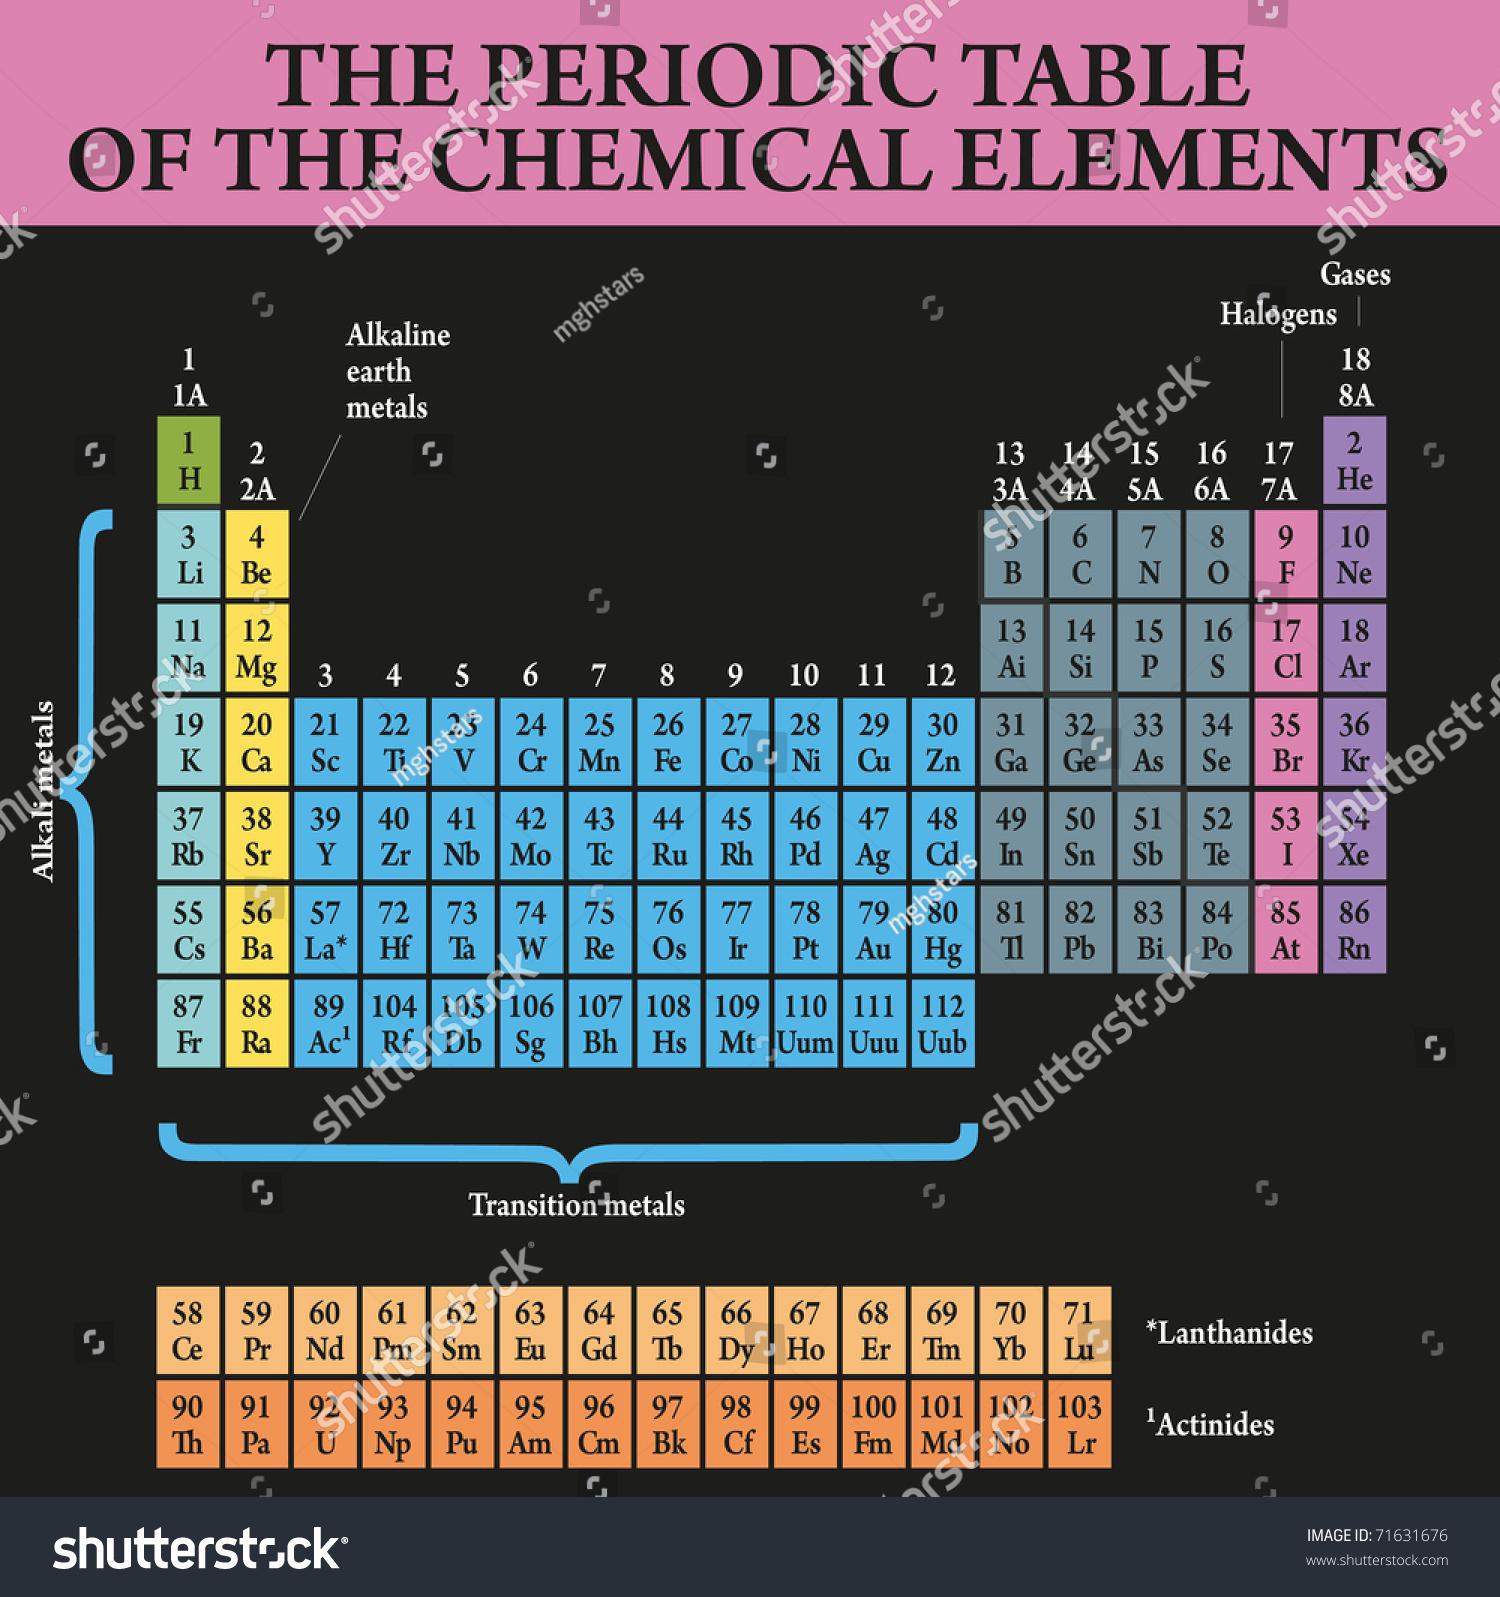 Periodic table study chemistry elements stock vector 2018 71631676 periodic table for the study of chemistry and the elements urtaz Choice Image